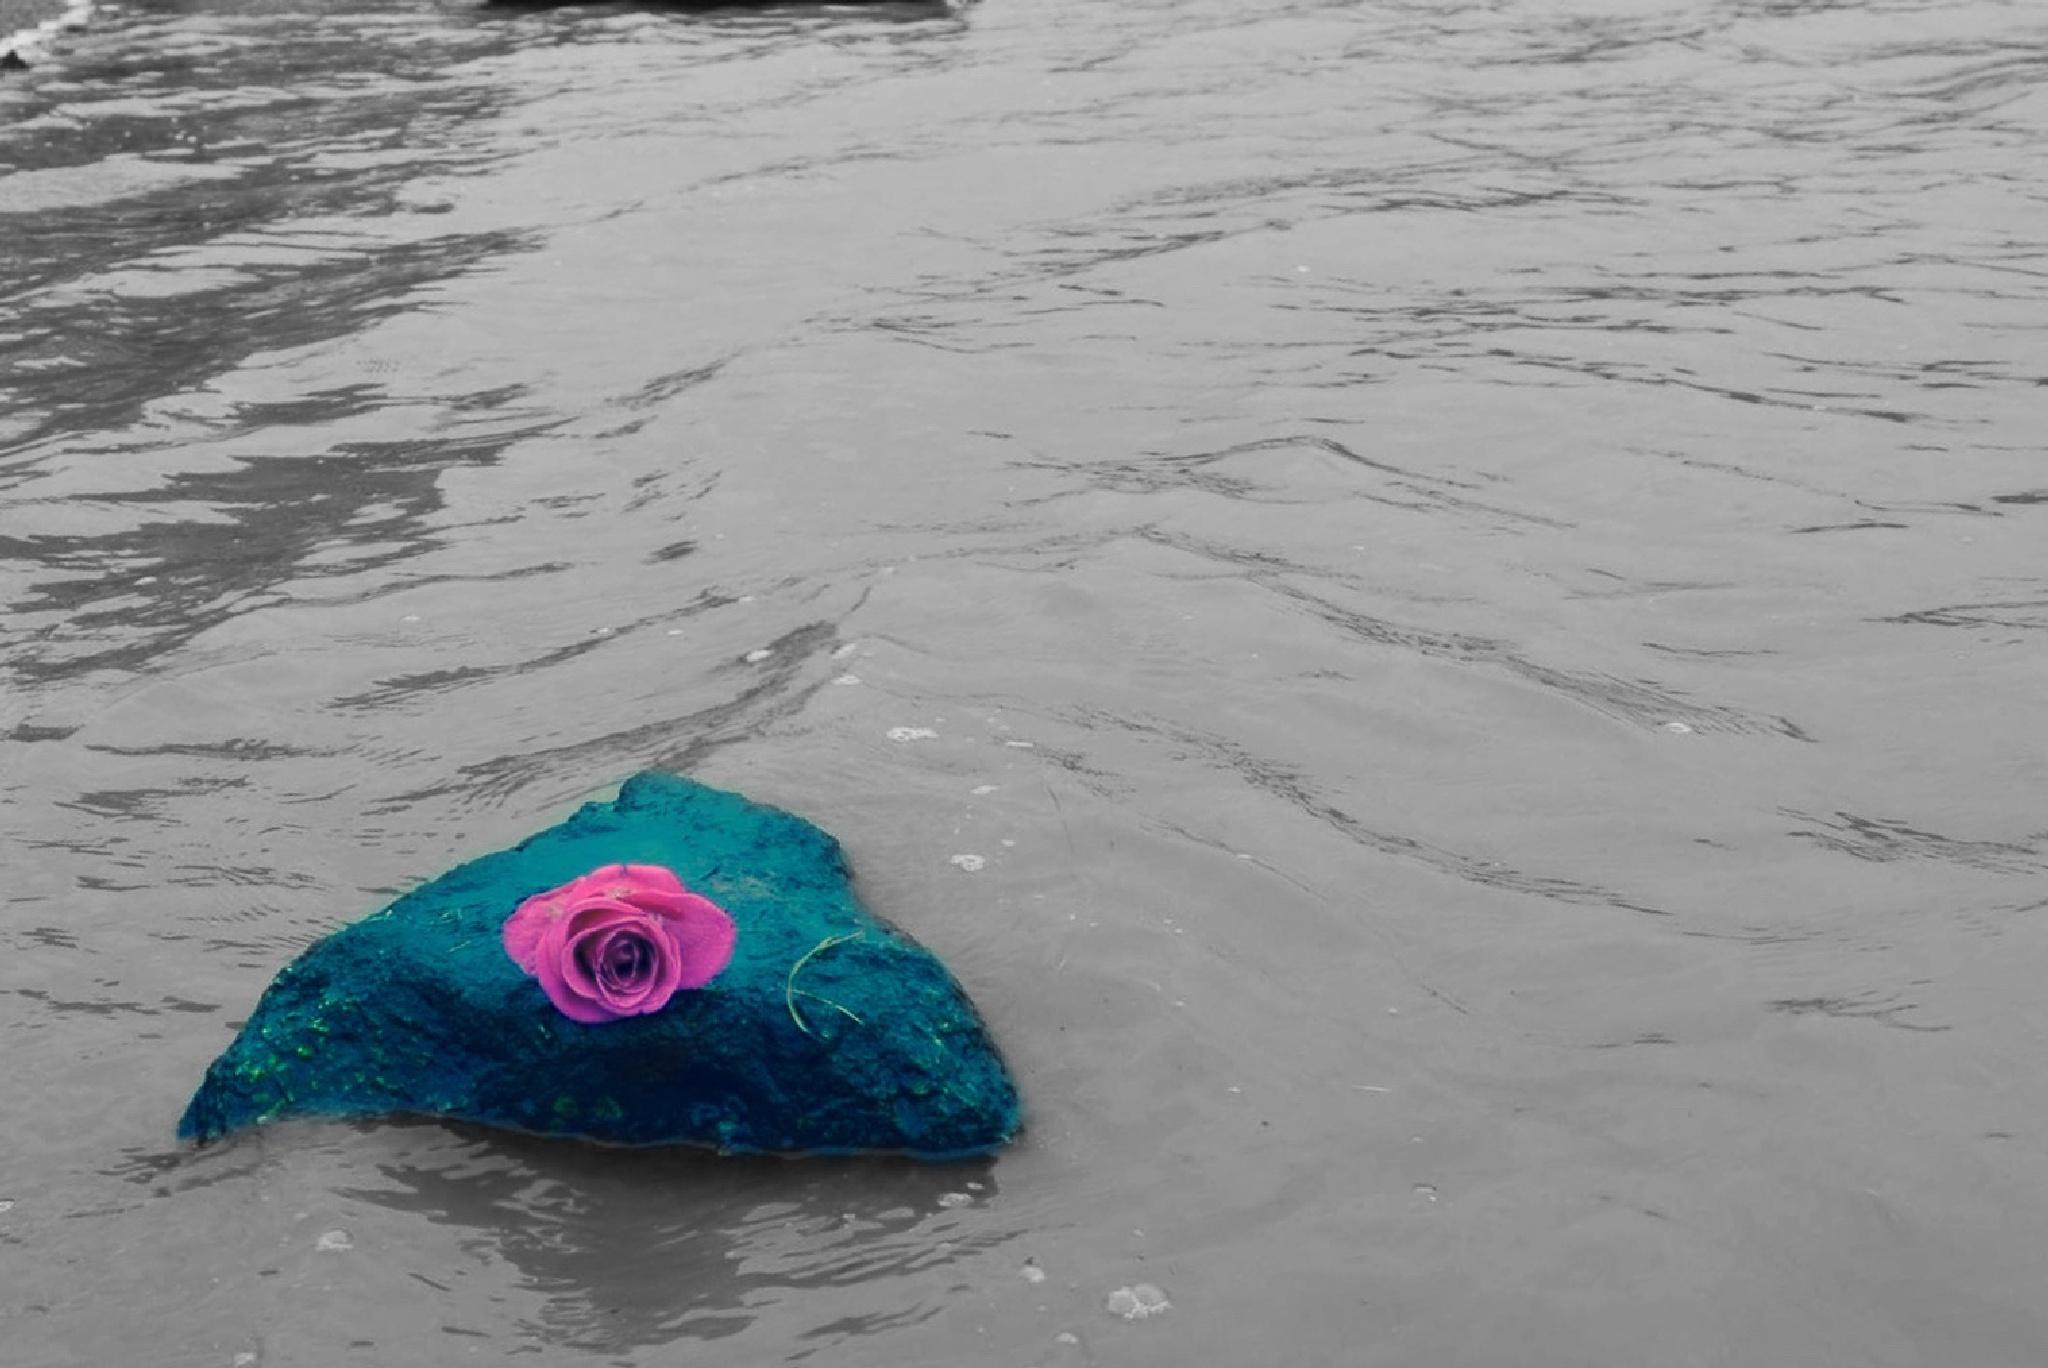 Lil rose  by Talana_smith